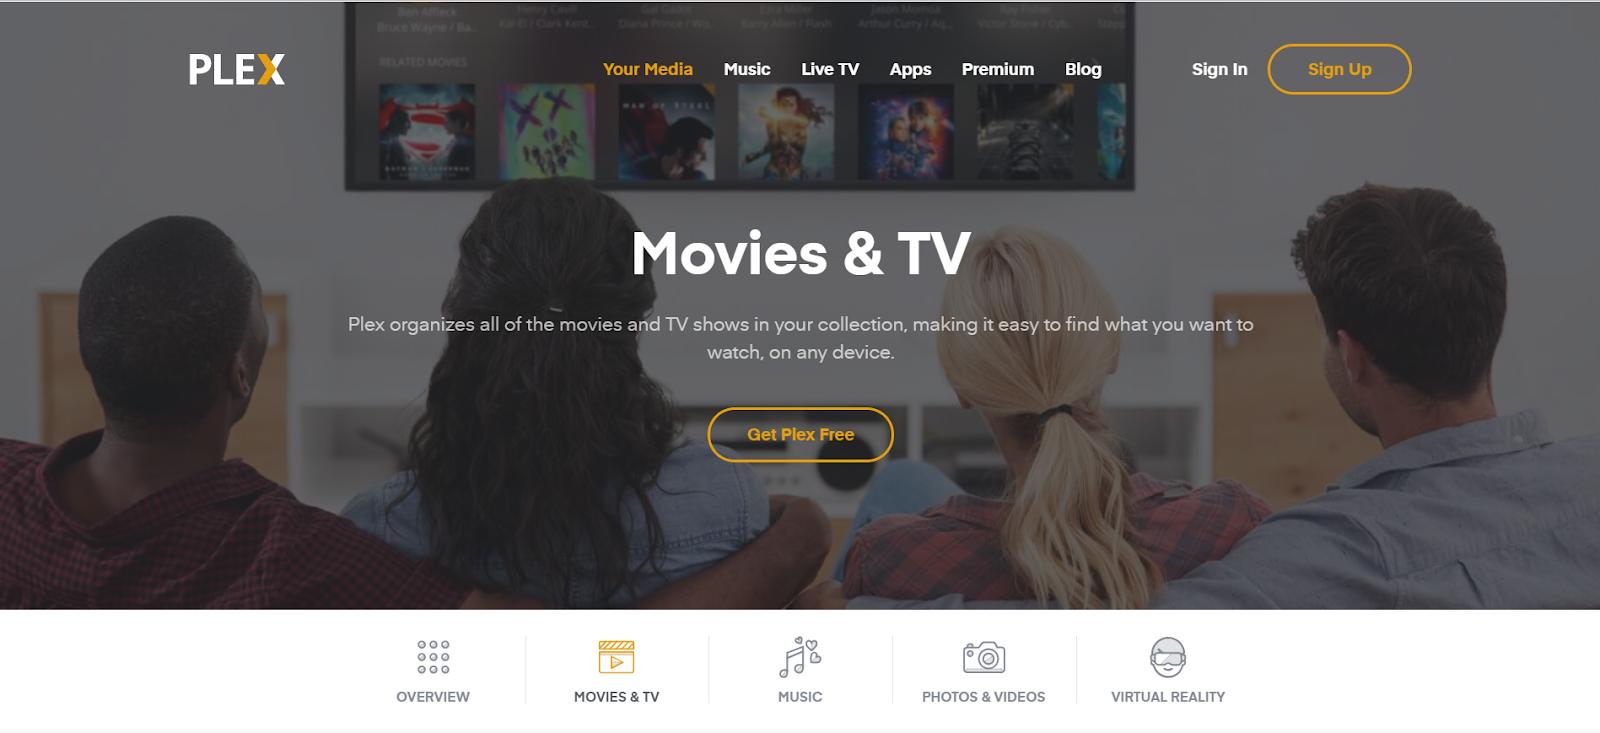 Website xem phim Plex